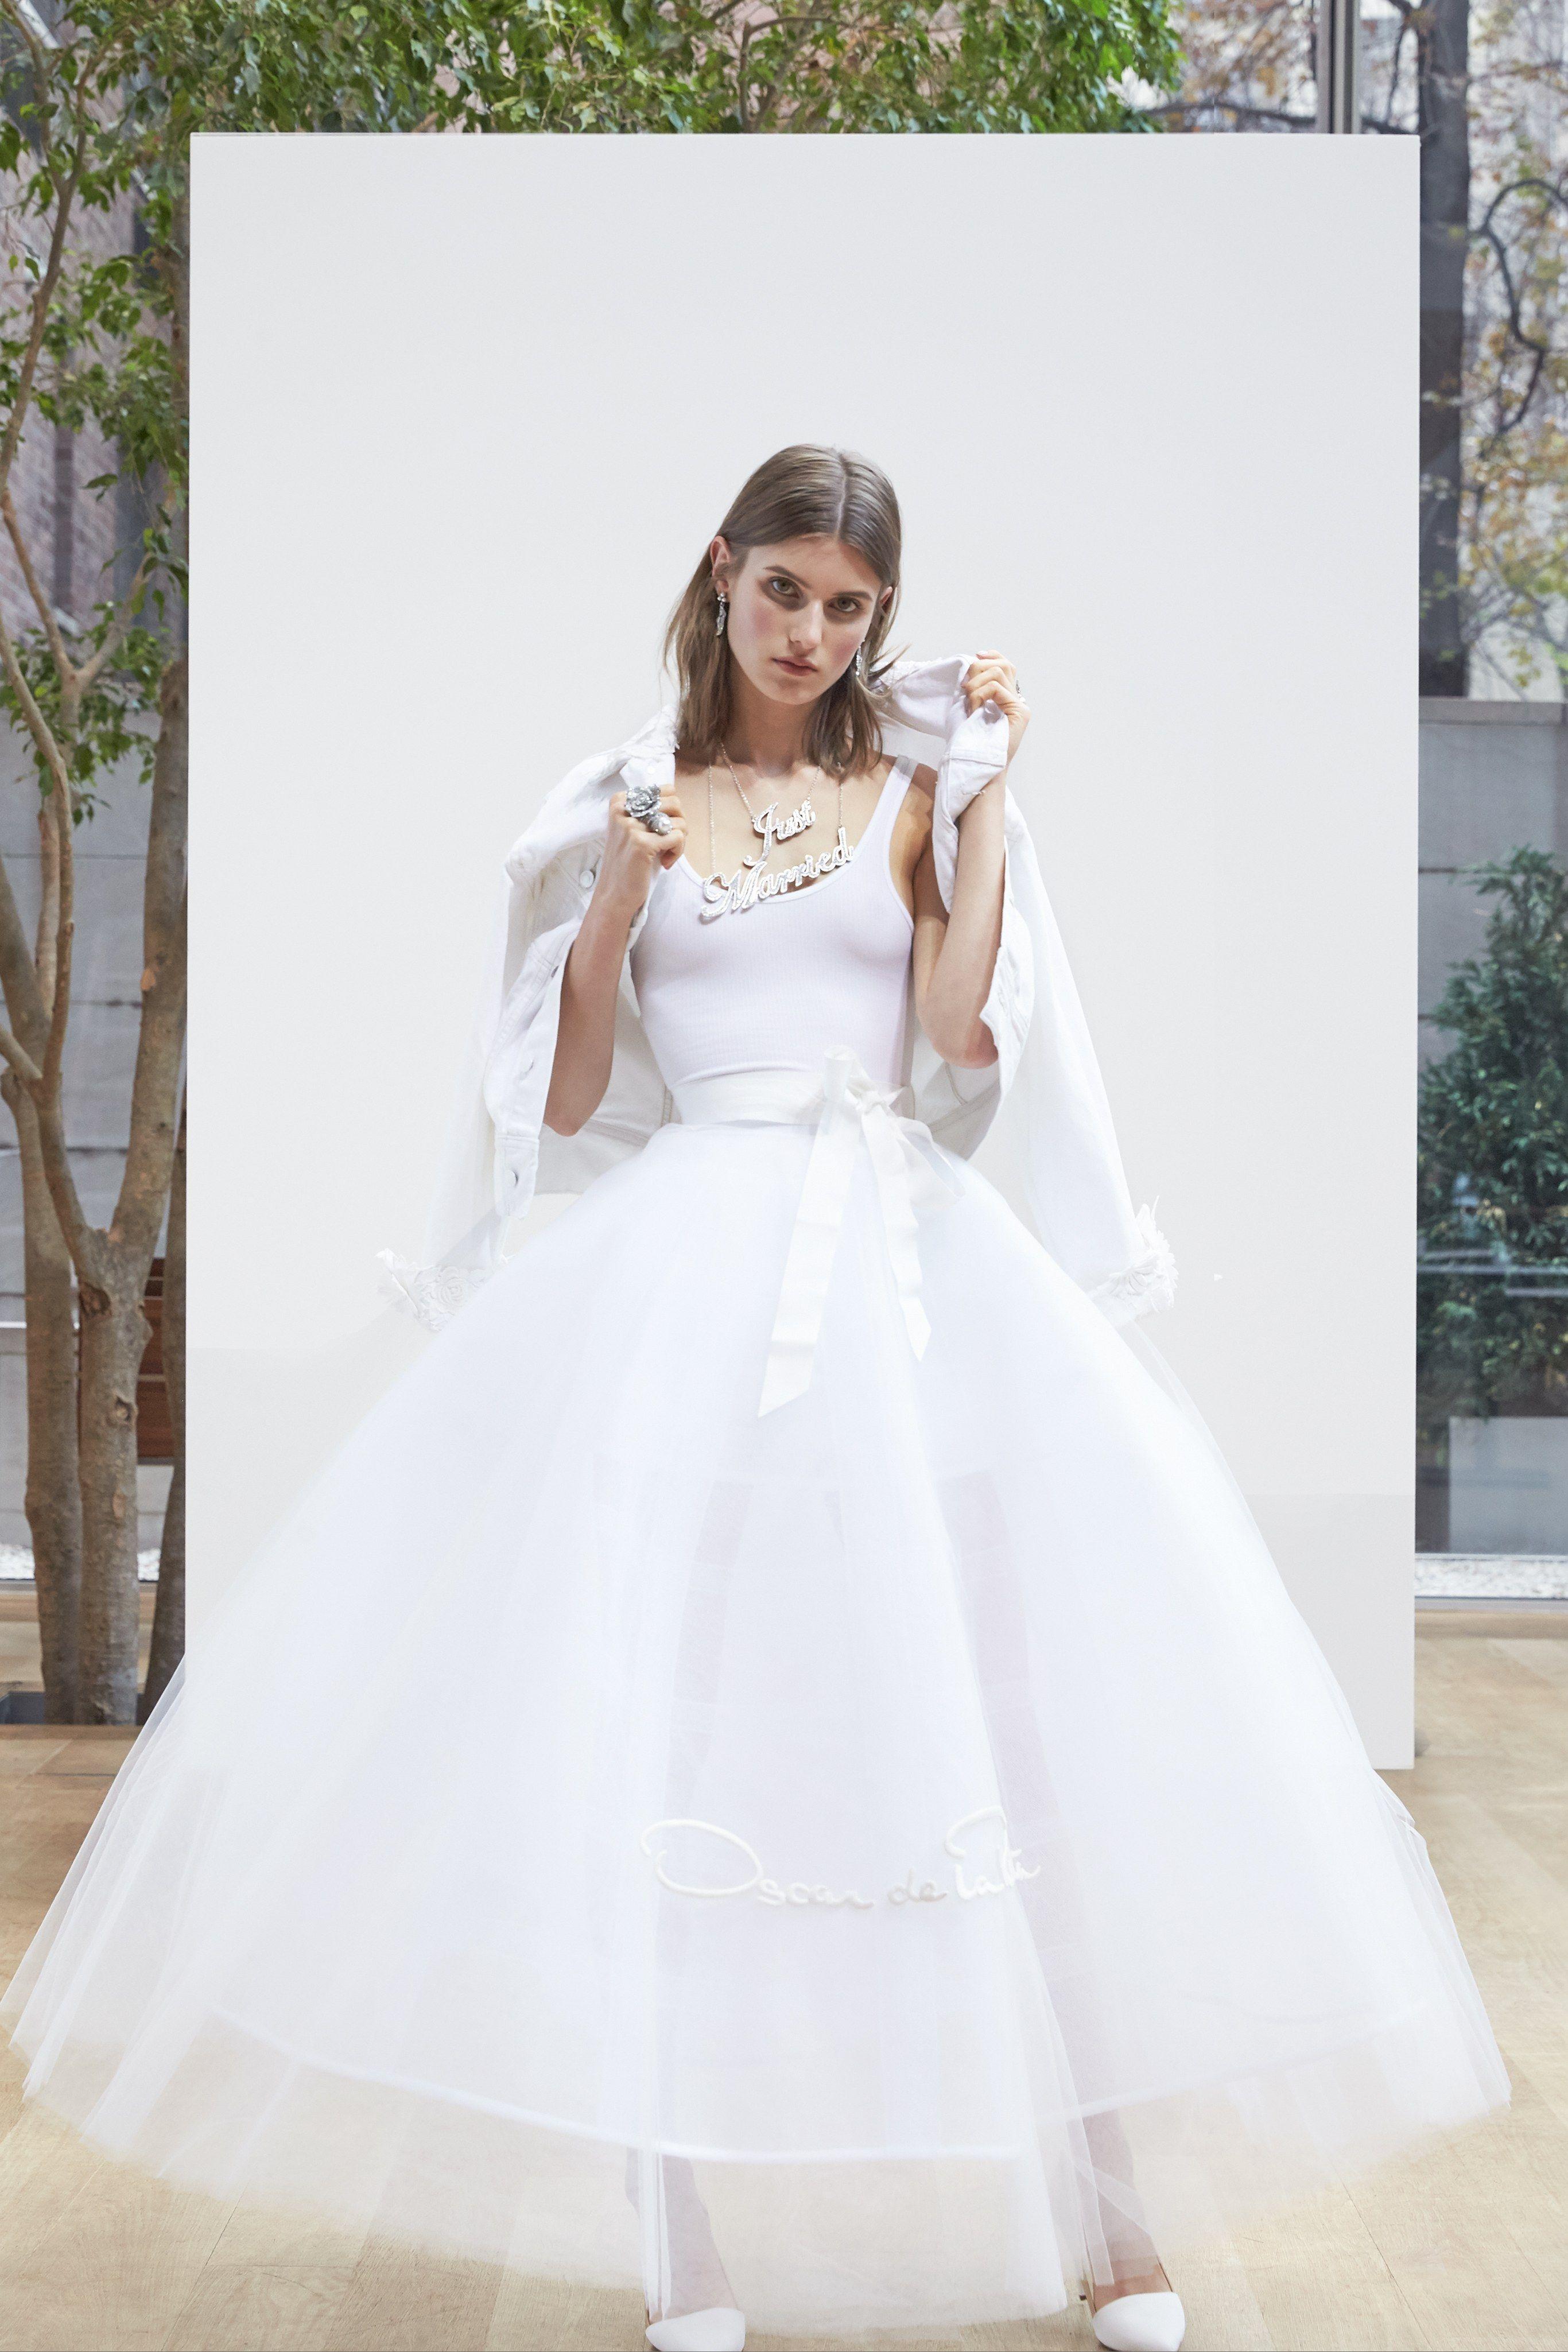 Oscar De La Renta Bridal Wedding Dress Collection Spring 2018 Brides: Wedding Dresses With Denim At Websimilar.org